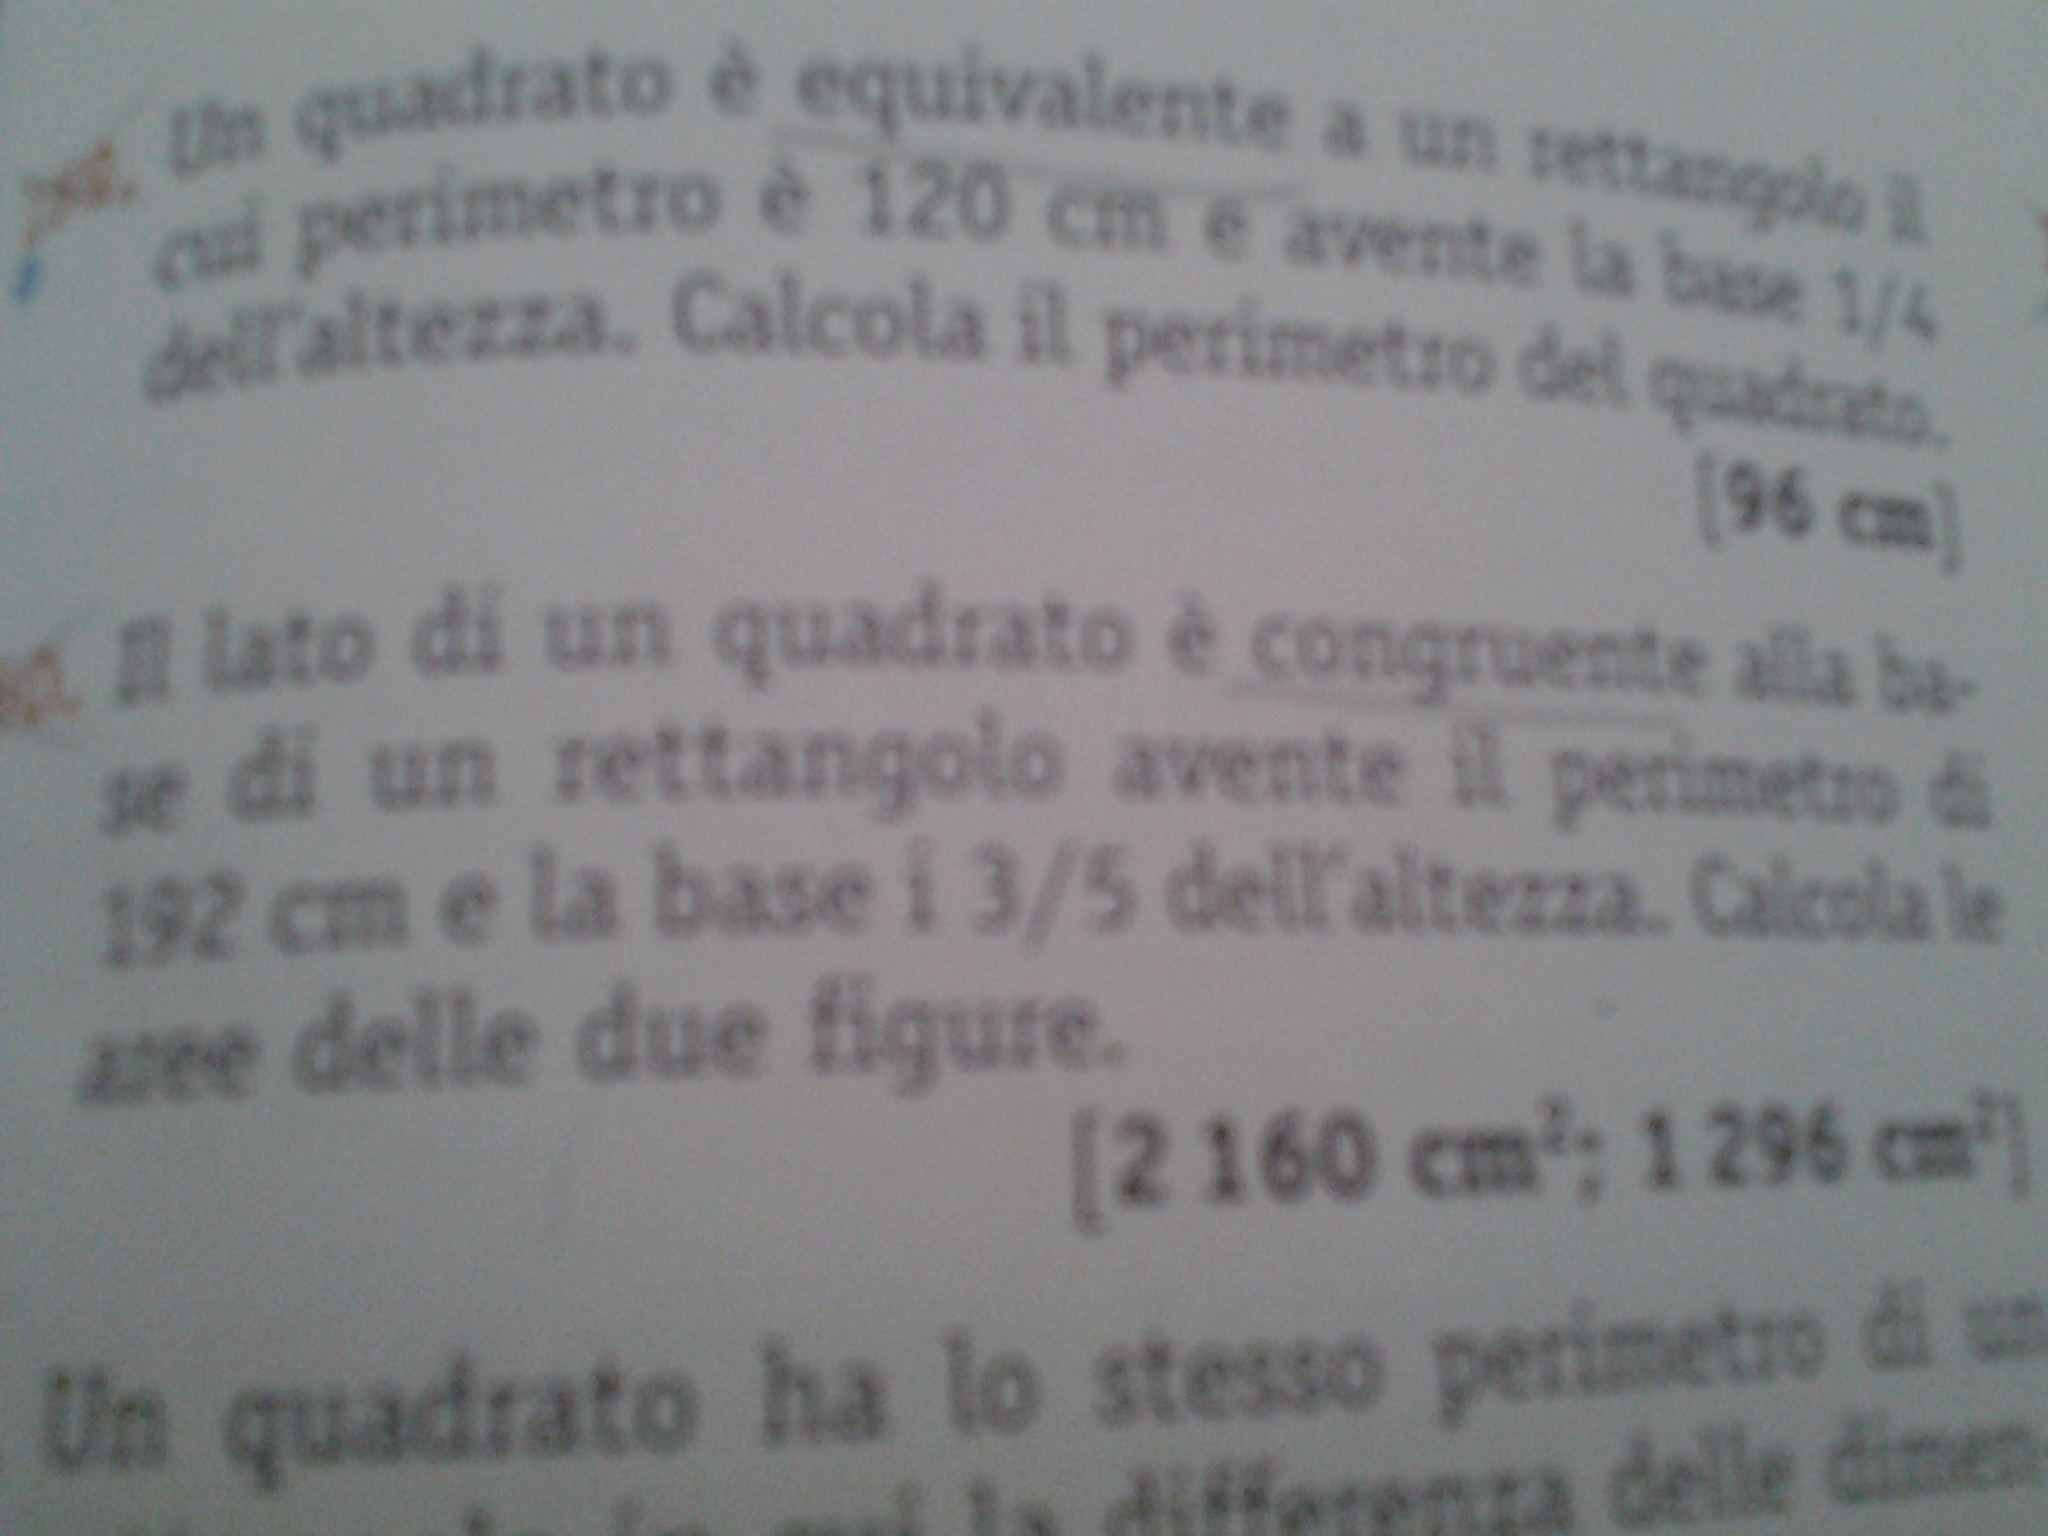 Quadrato Matebook